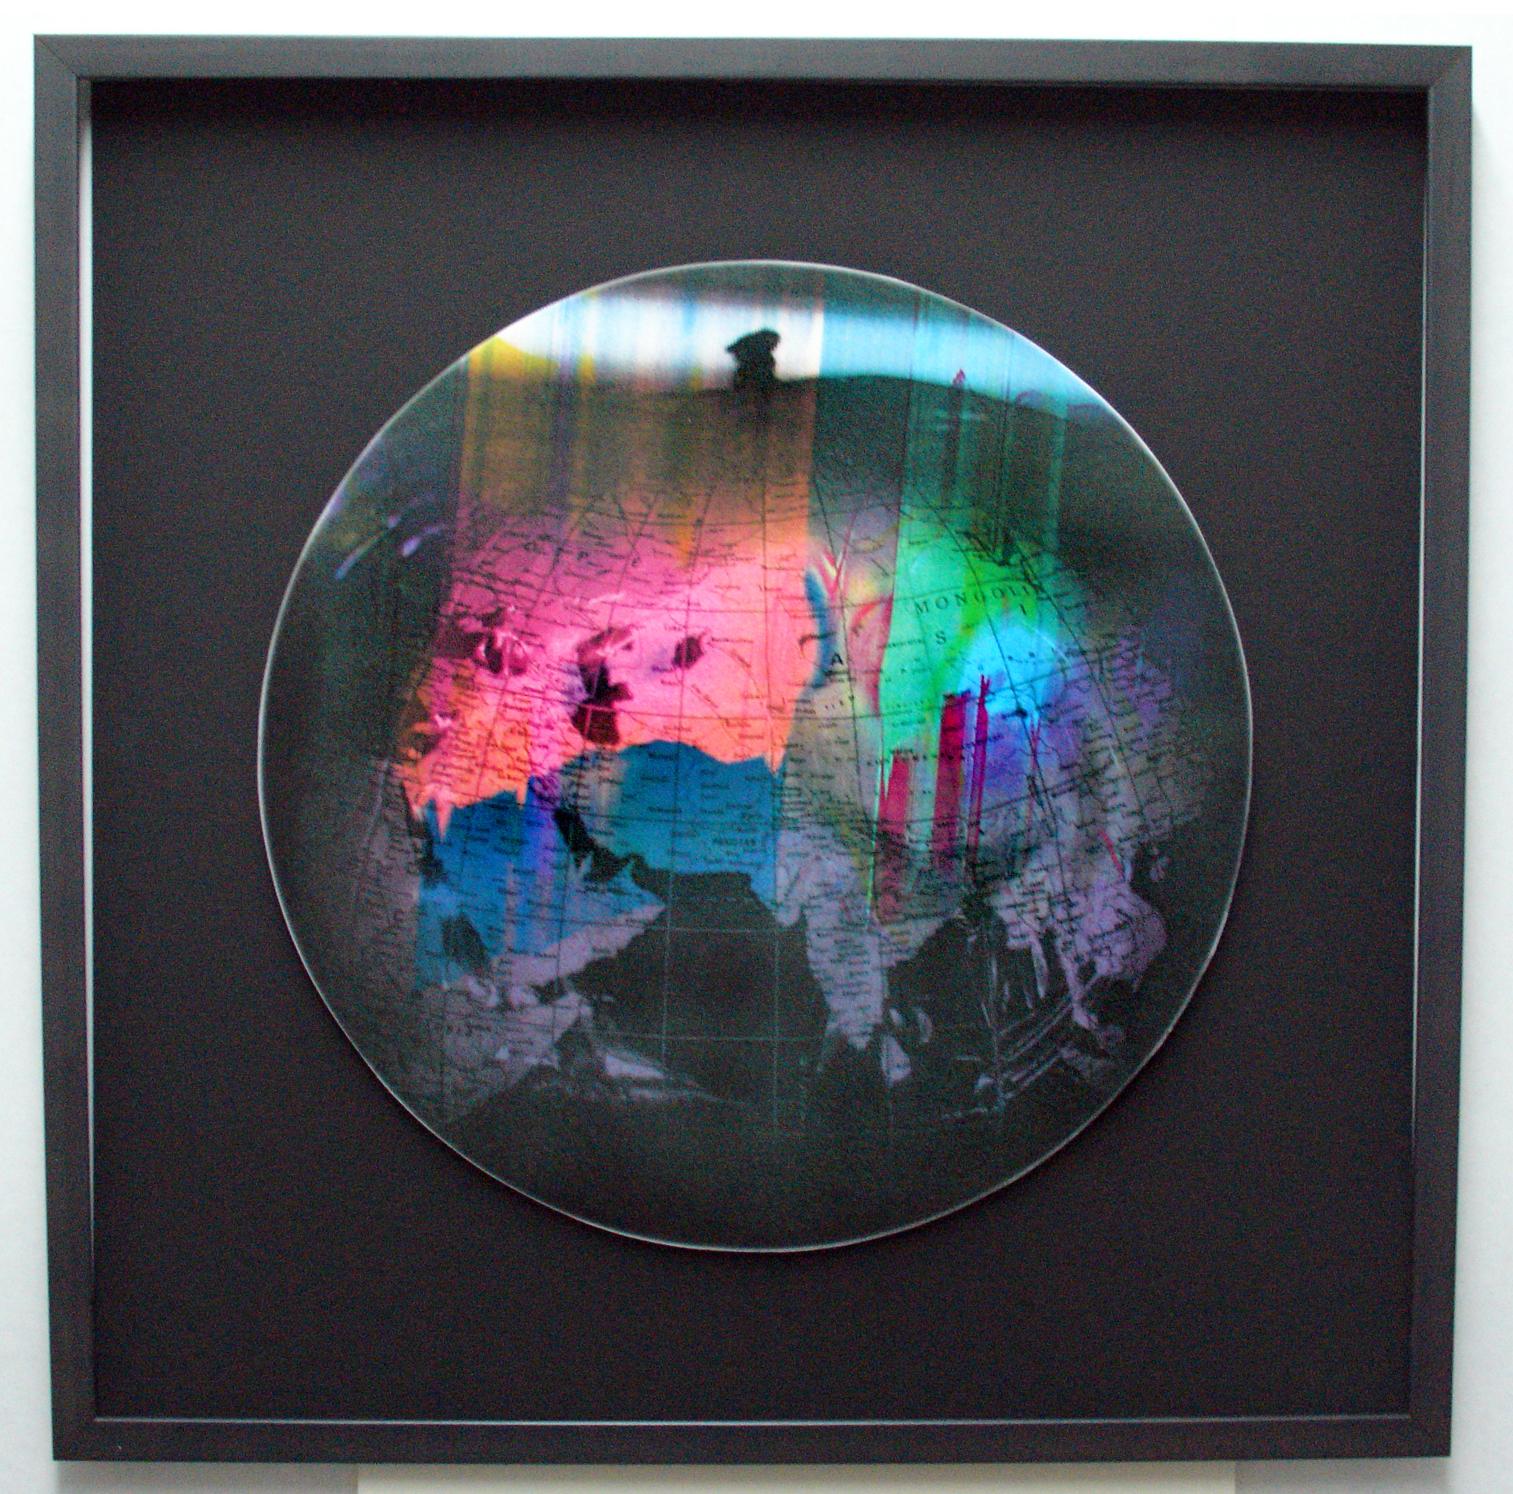 """En reconstruction I"", 2008 Digital rework of 1993  Bubble Jet  photocopy"